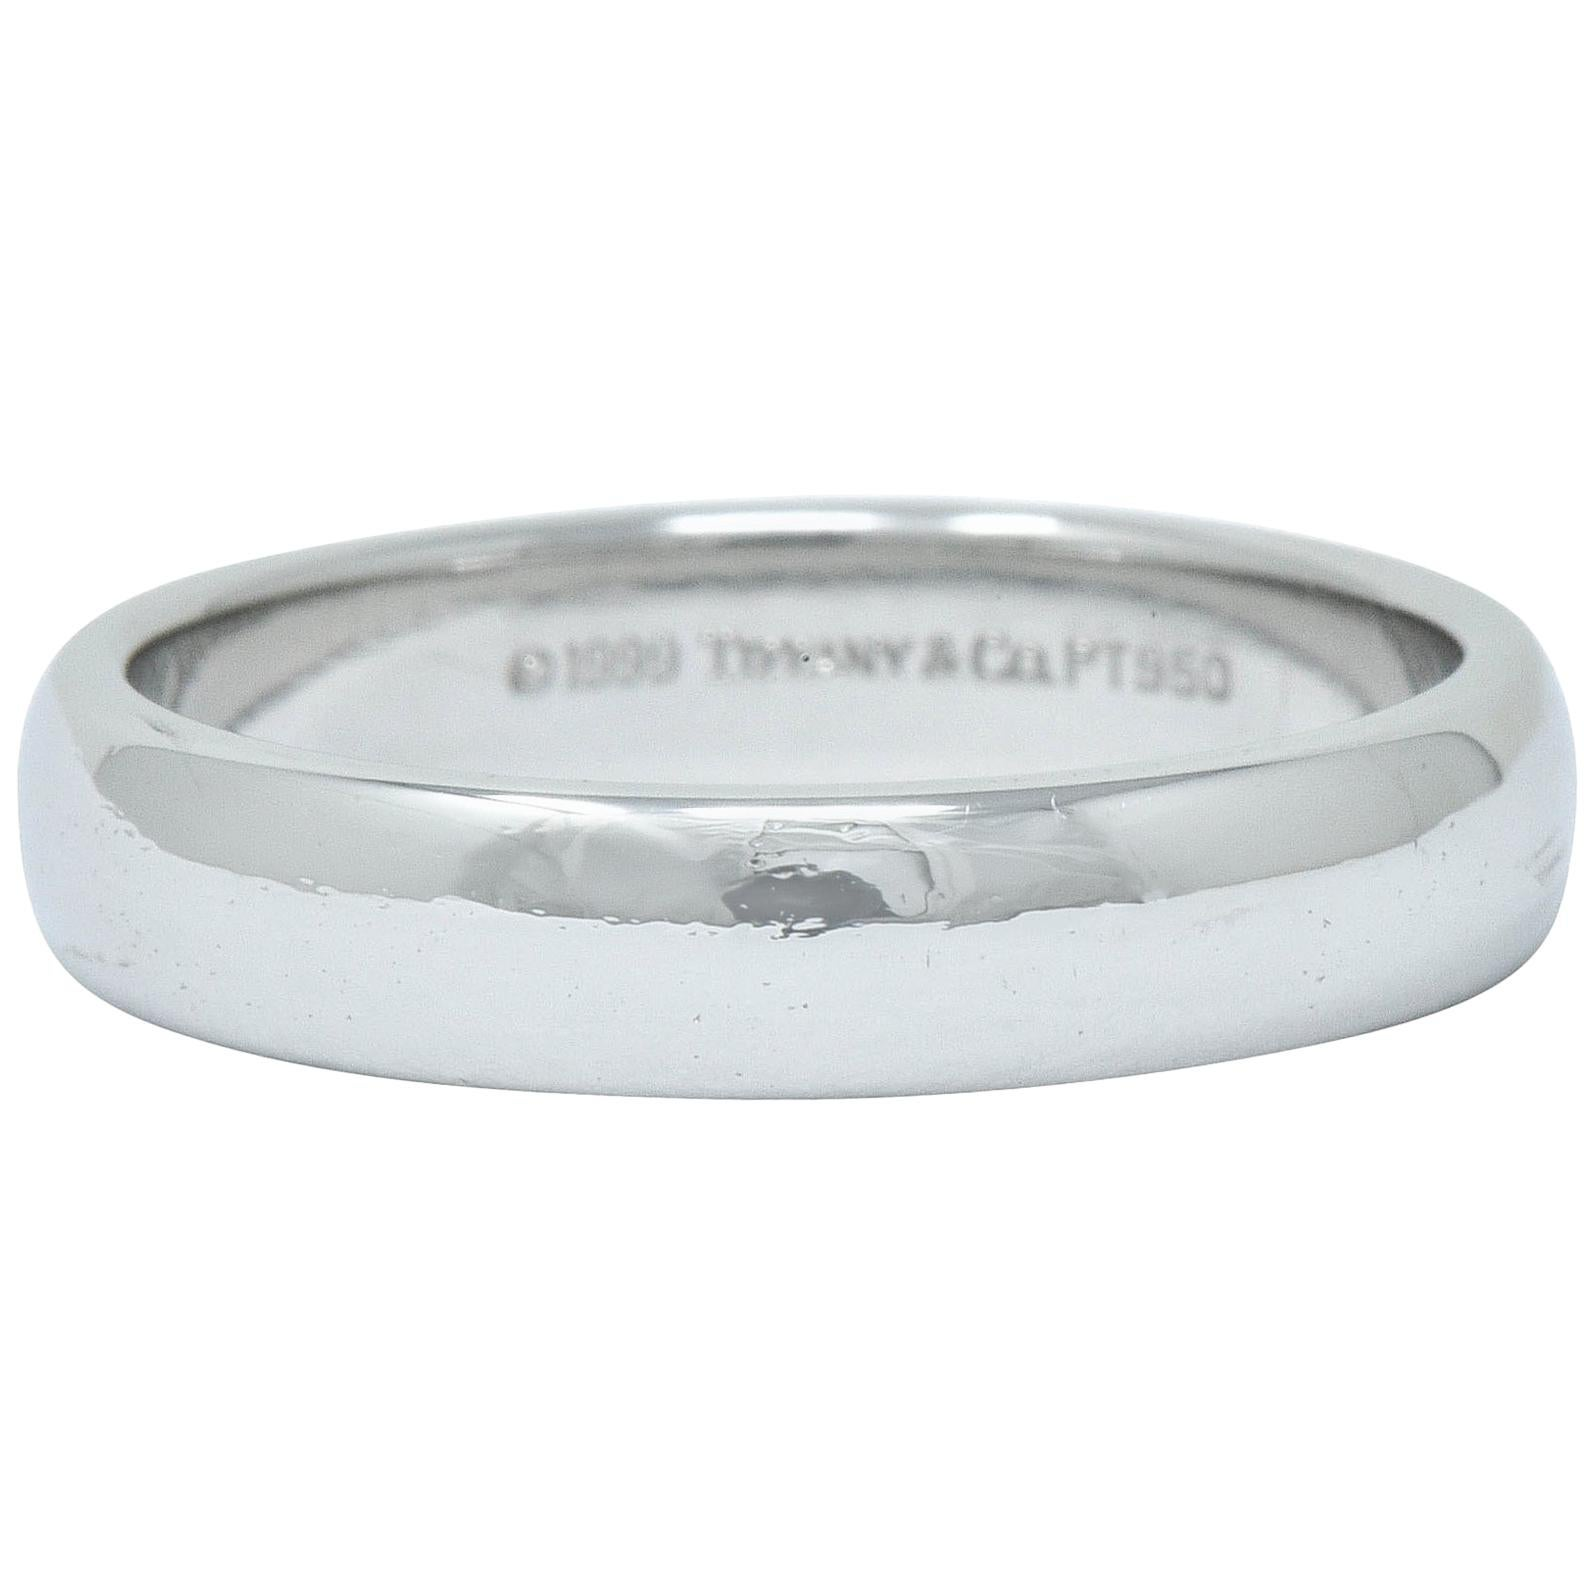 Tiffany & Co. Platinum Men's Wedding Band Ring